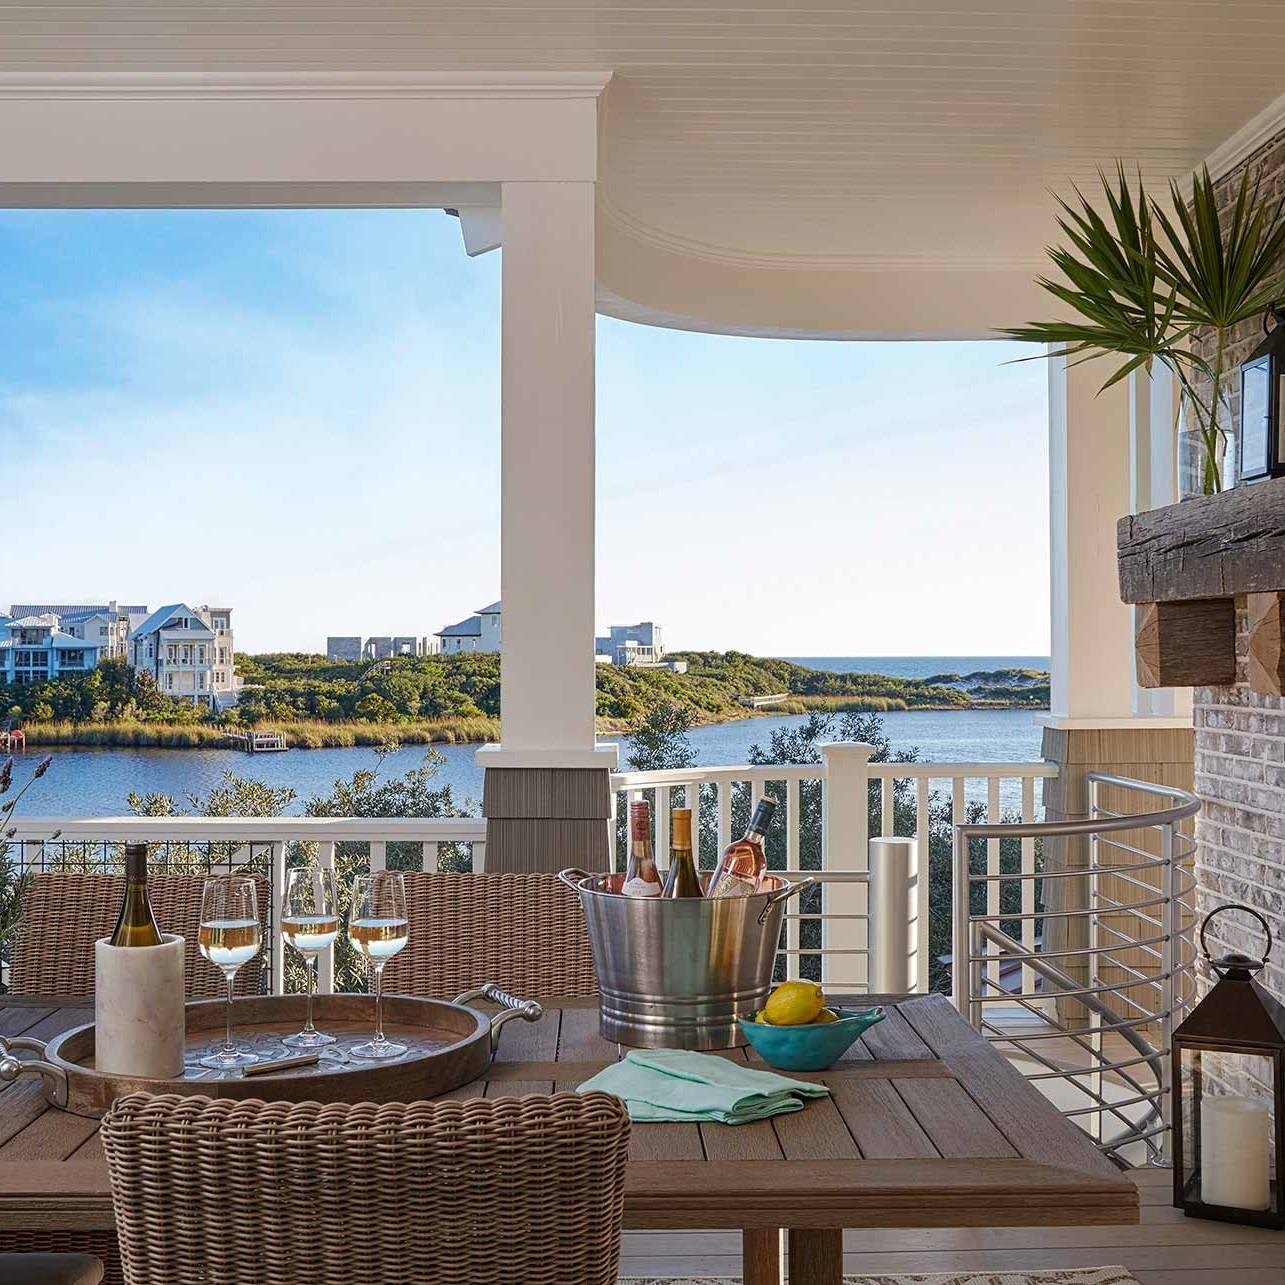 Beach house patio design by Darci Hether New York in Watersound beach